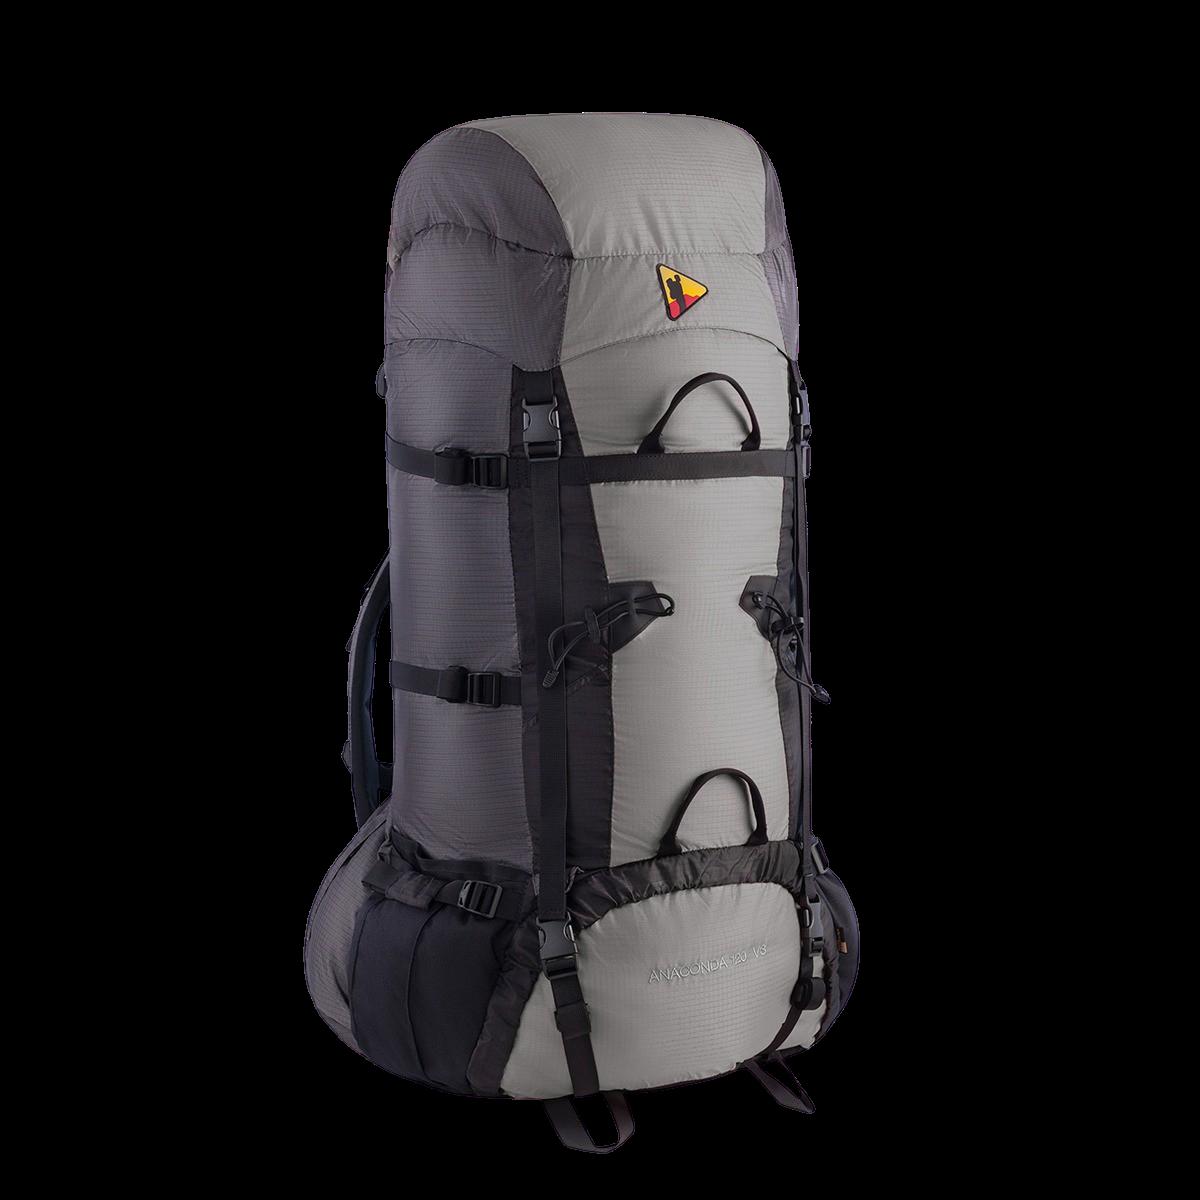 Туристический рюкзак BASK ANACONDA 120 V3 фото